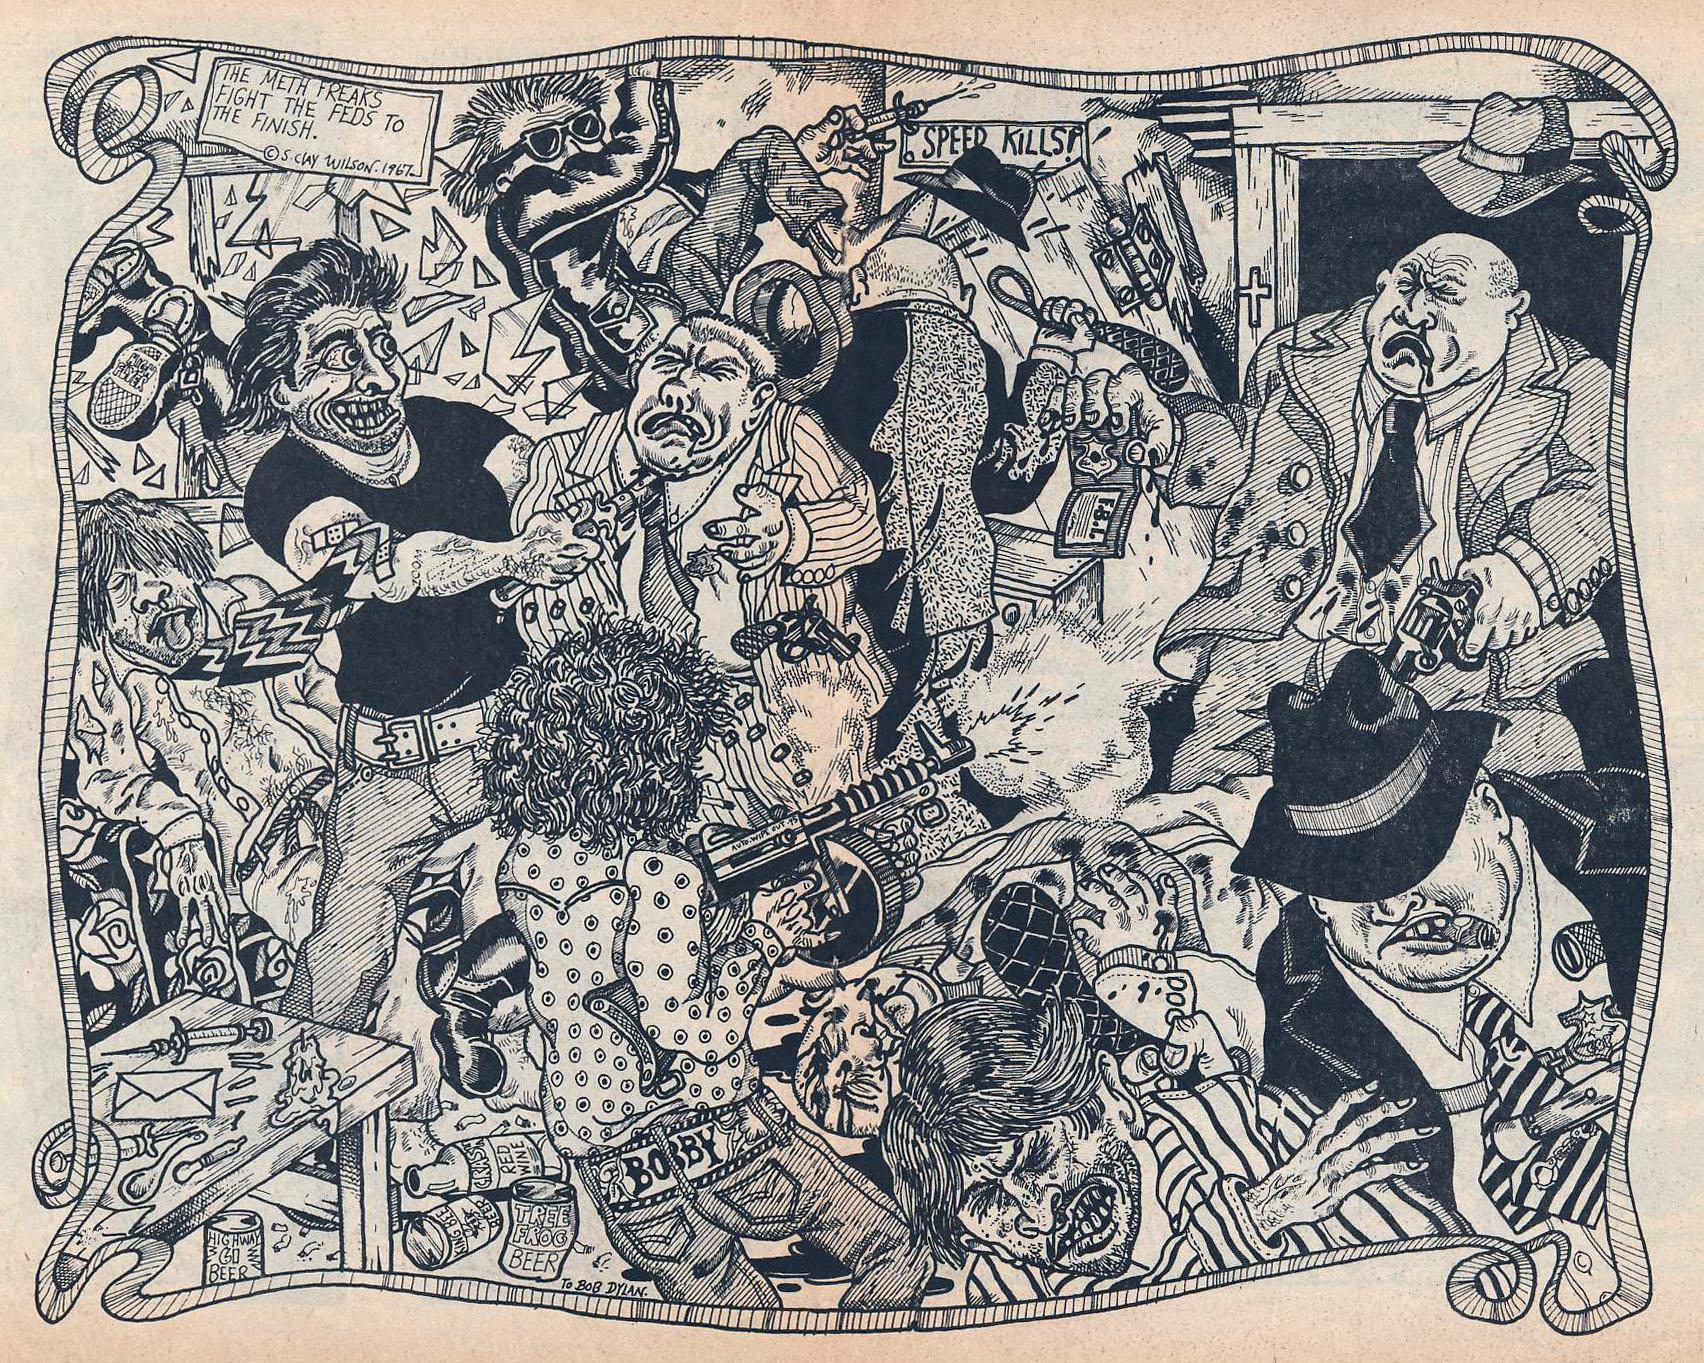 Radical America Komiks В3 #1 - Страница 24